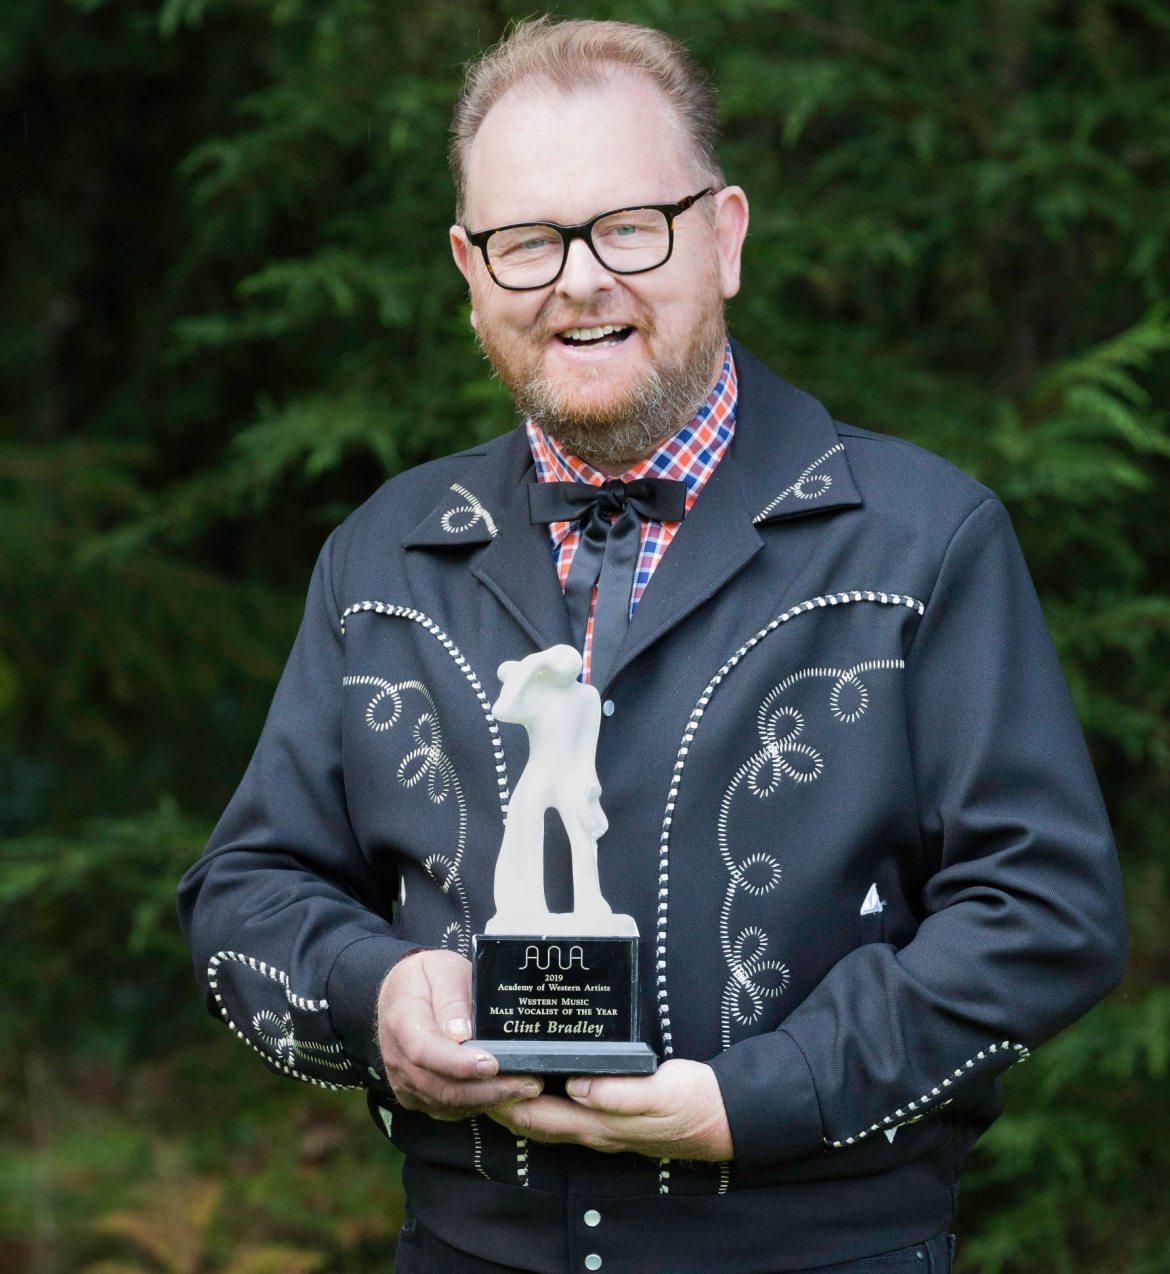 Clint Bradley mit dem AWA Award